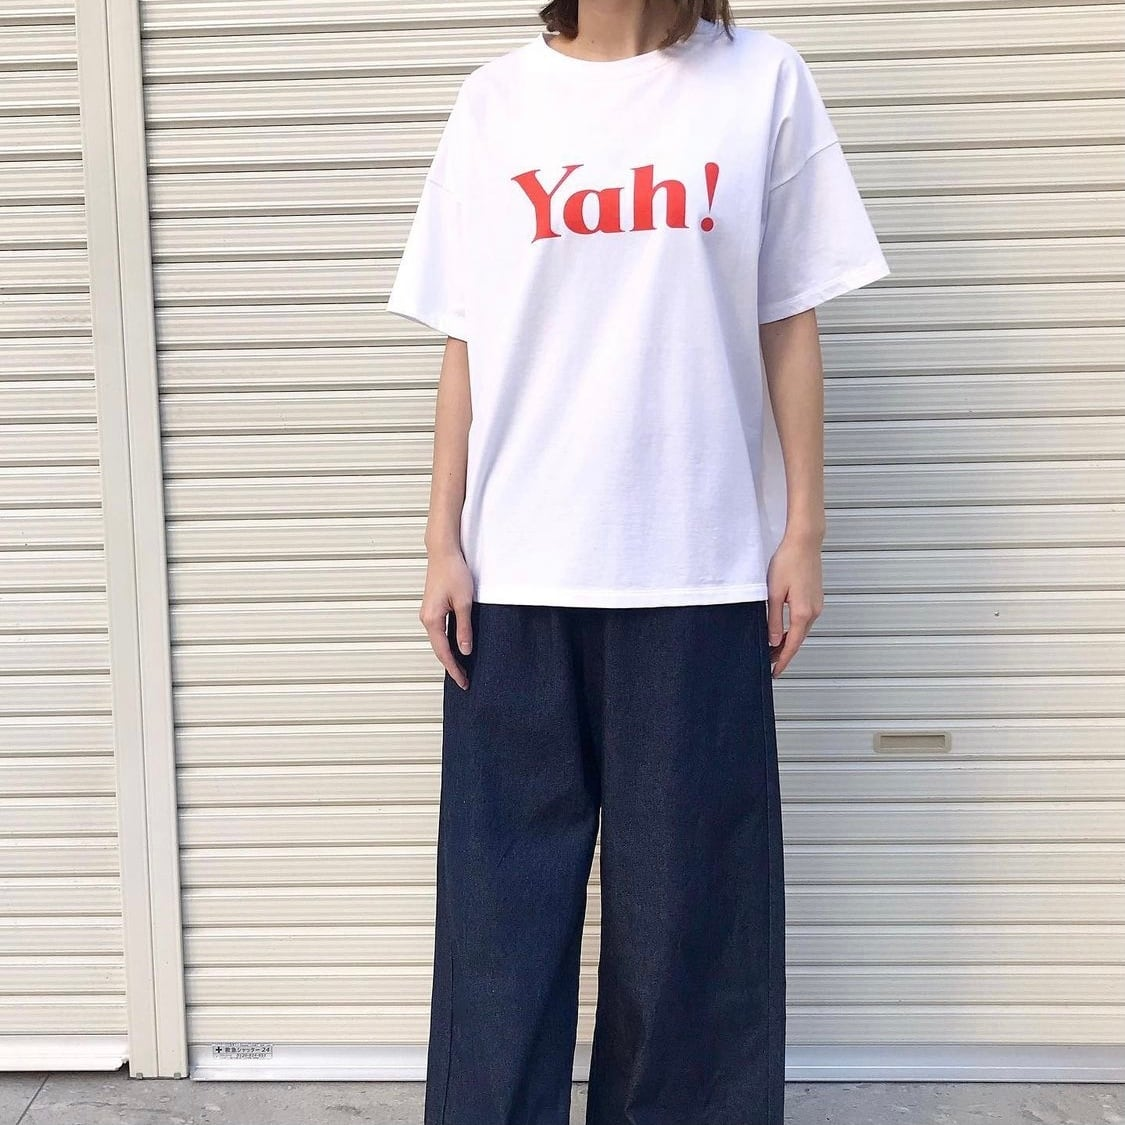 【 siro de labonte 】- R123212 - yah!ワイドTシャツ